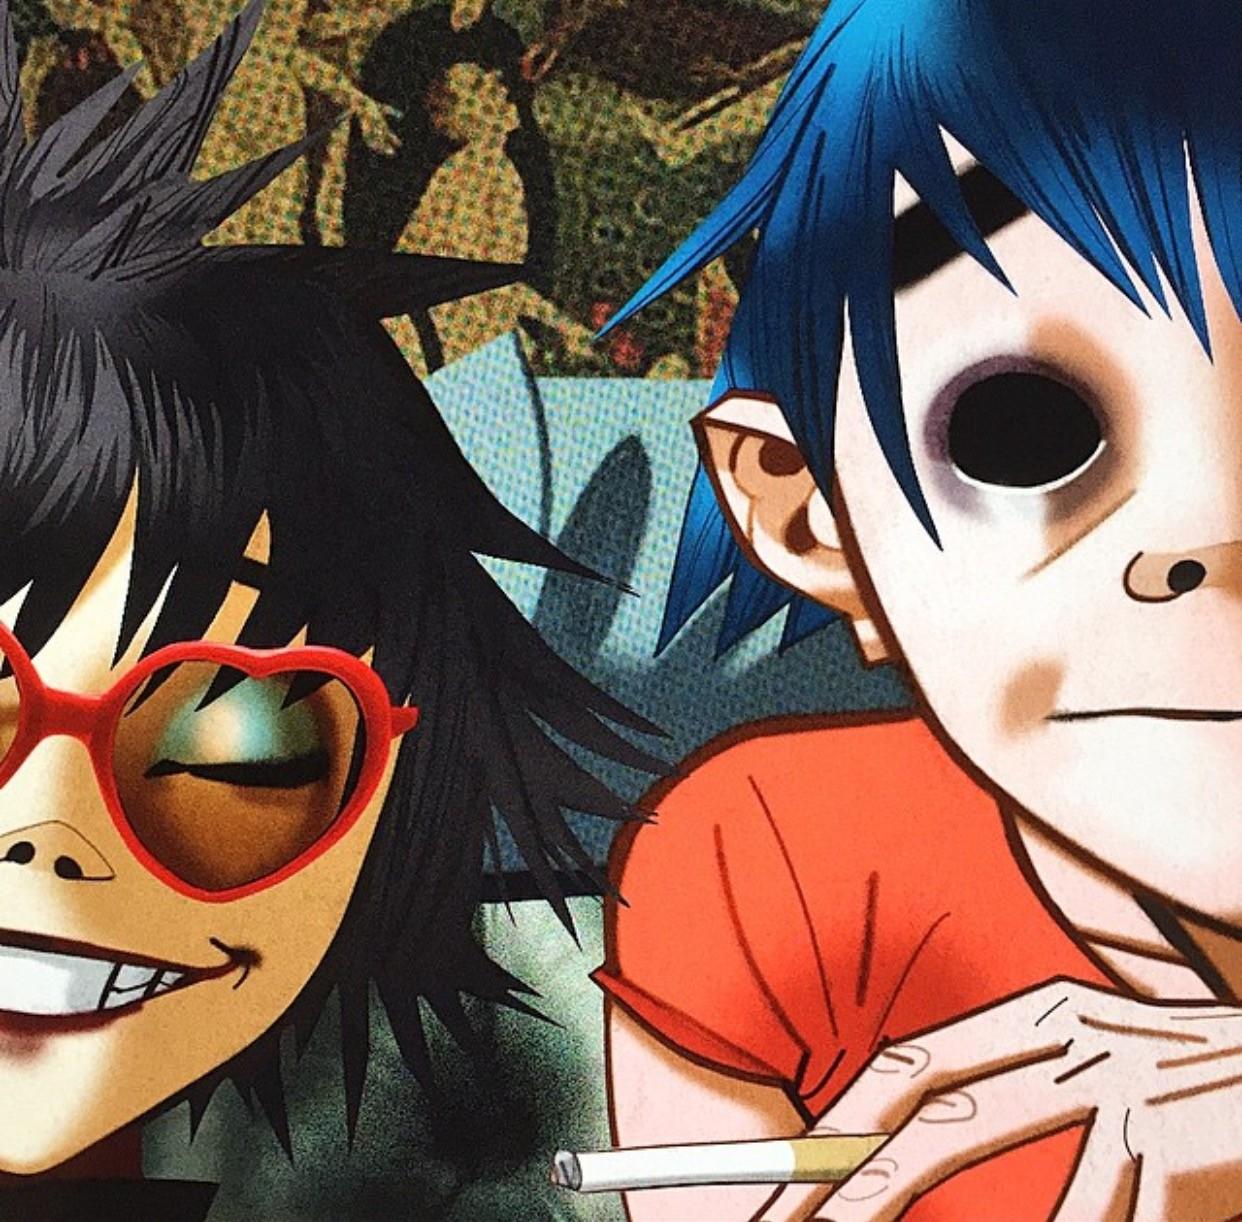 Wallpaper Illustration Anime Cartoon Jamie Hewlett